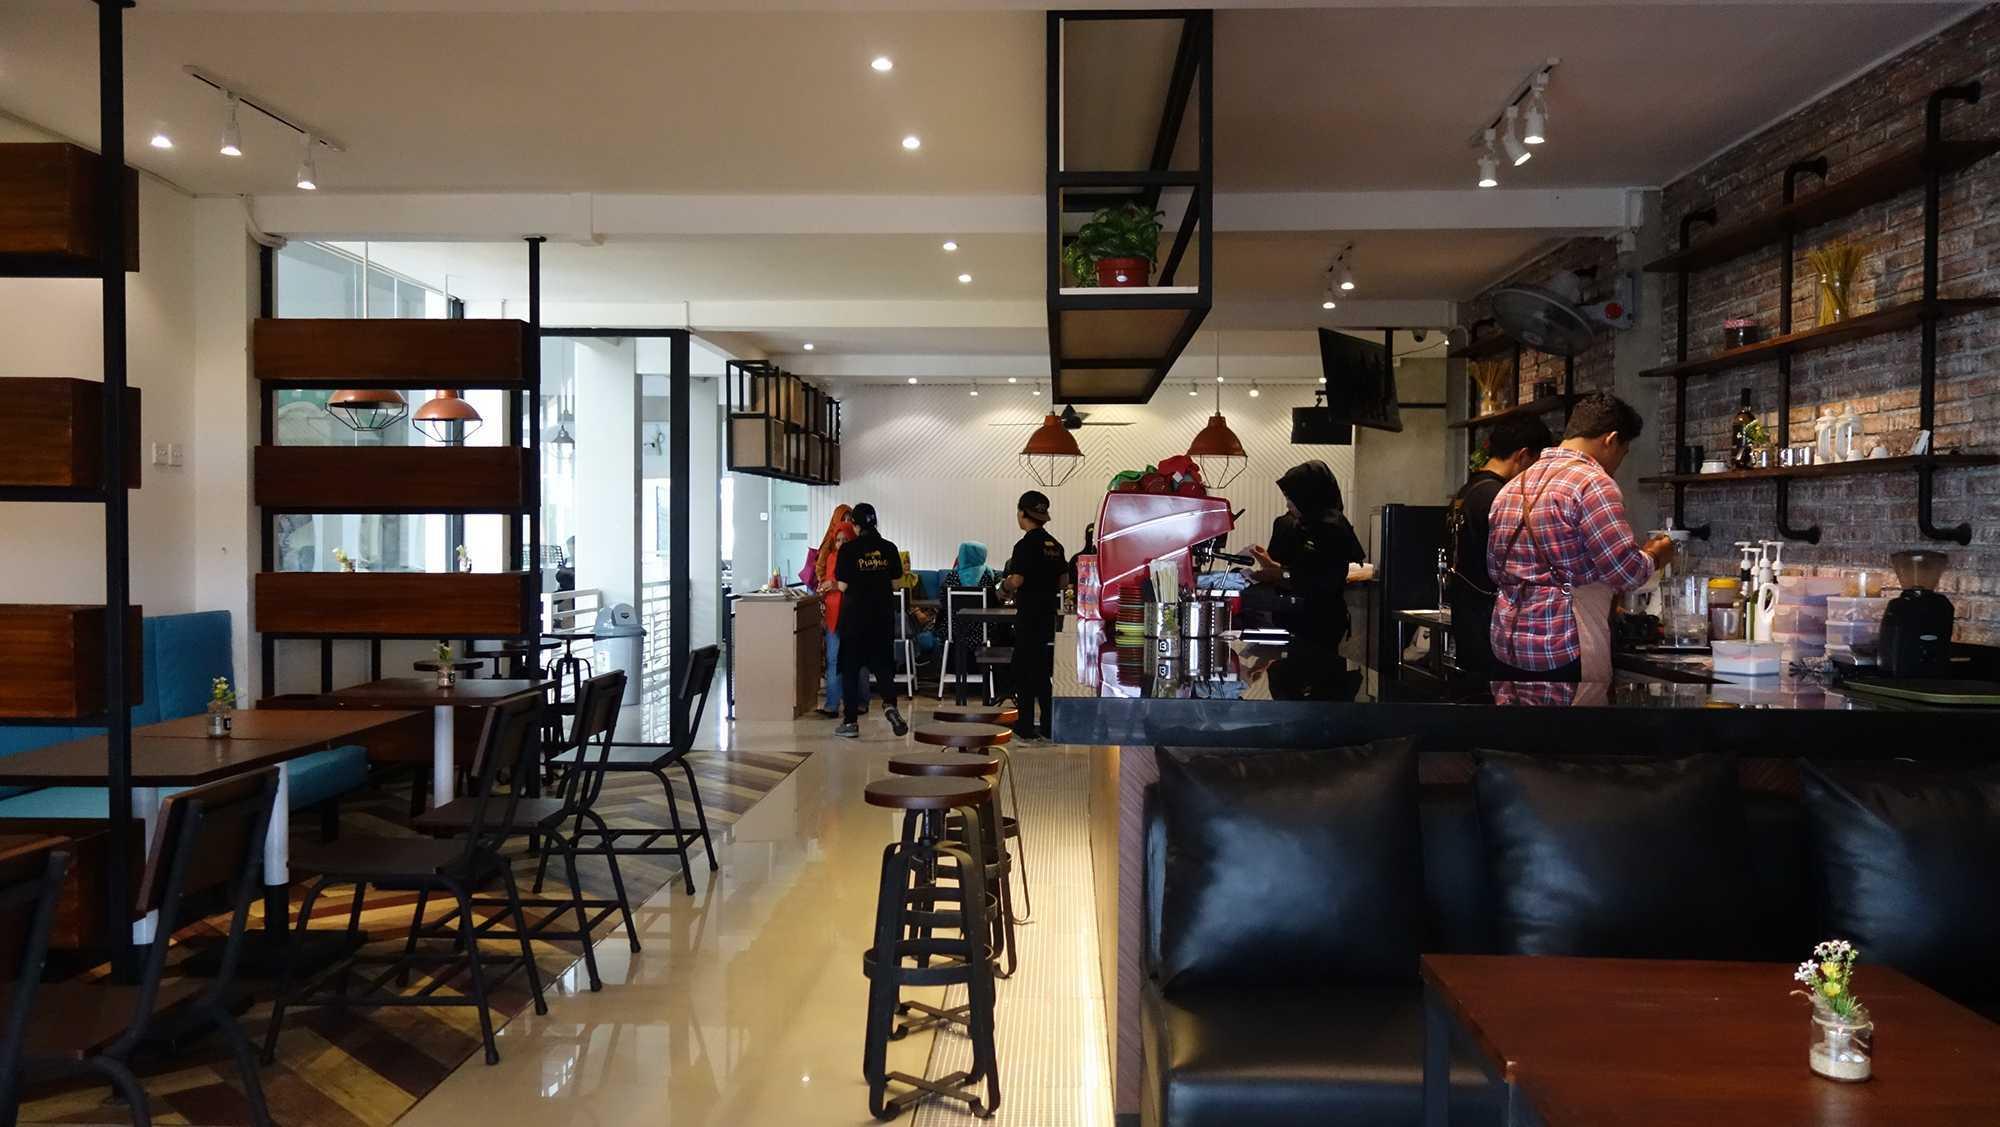 Aditya Wira Hardi Prague Coffee And Eatery Madiun, Kota Madiun, Jawa Timur, Indonesia Madiun, Kota Madiun, Jawa Timur, Indonesia Aditya-Wira-Hardi-Prague-Coffee-And-Eatery   65907